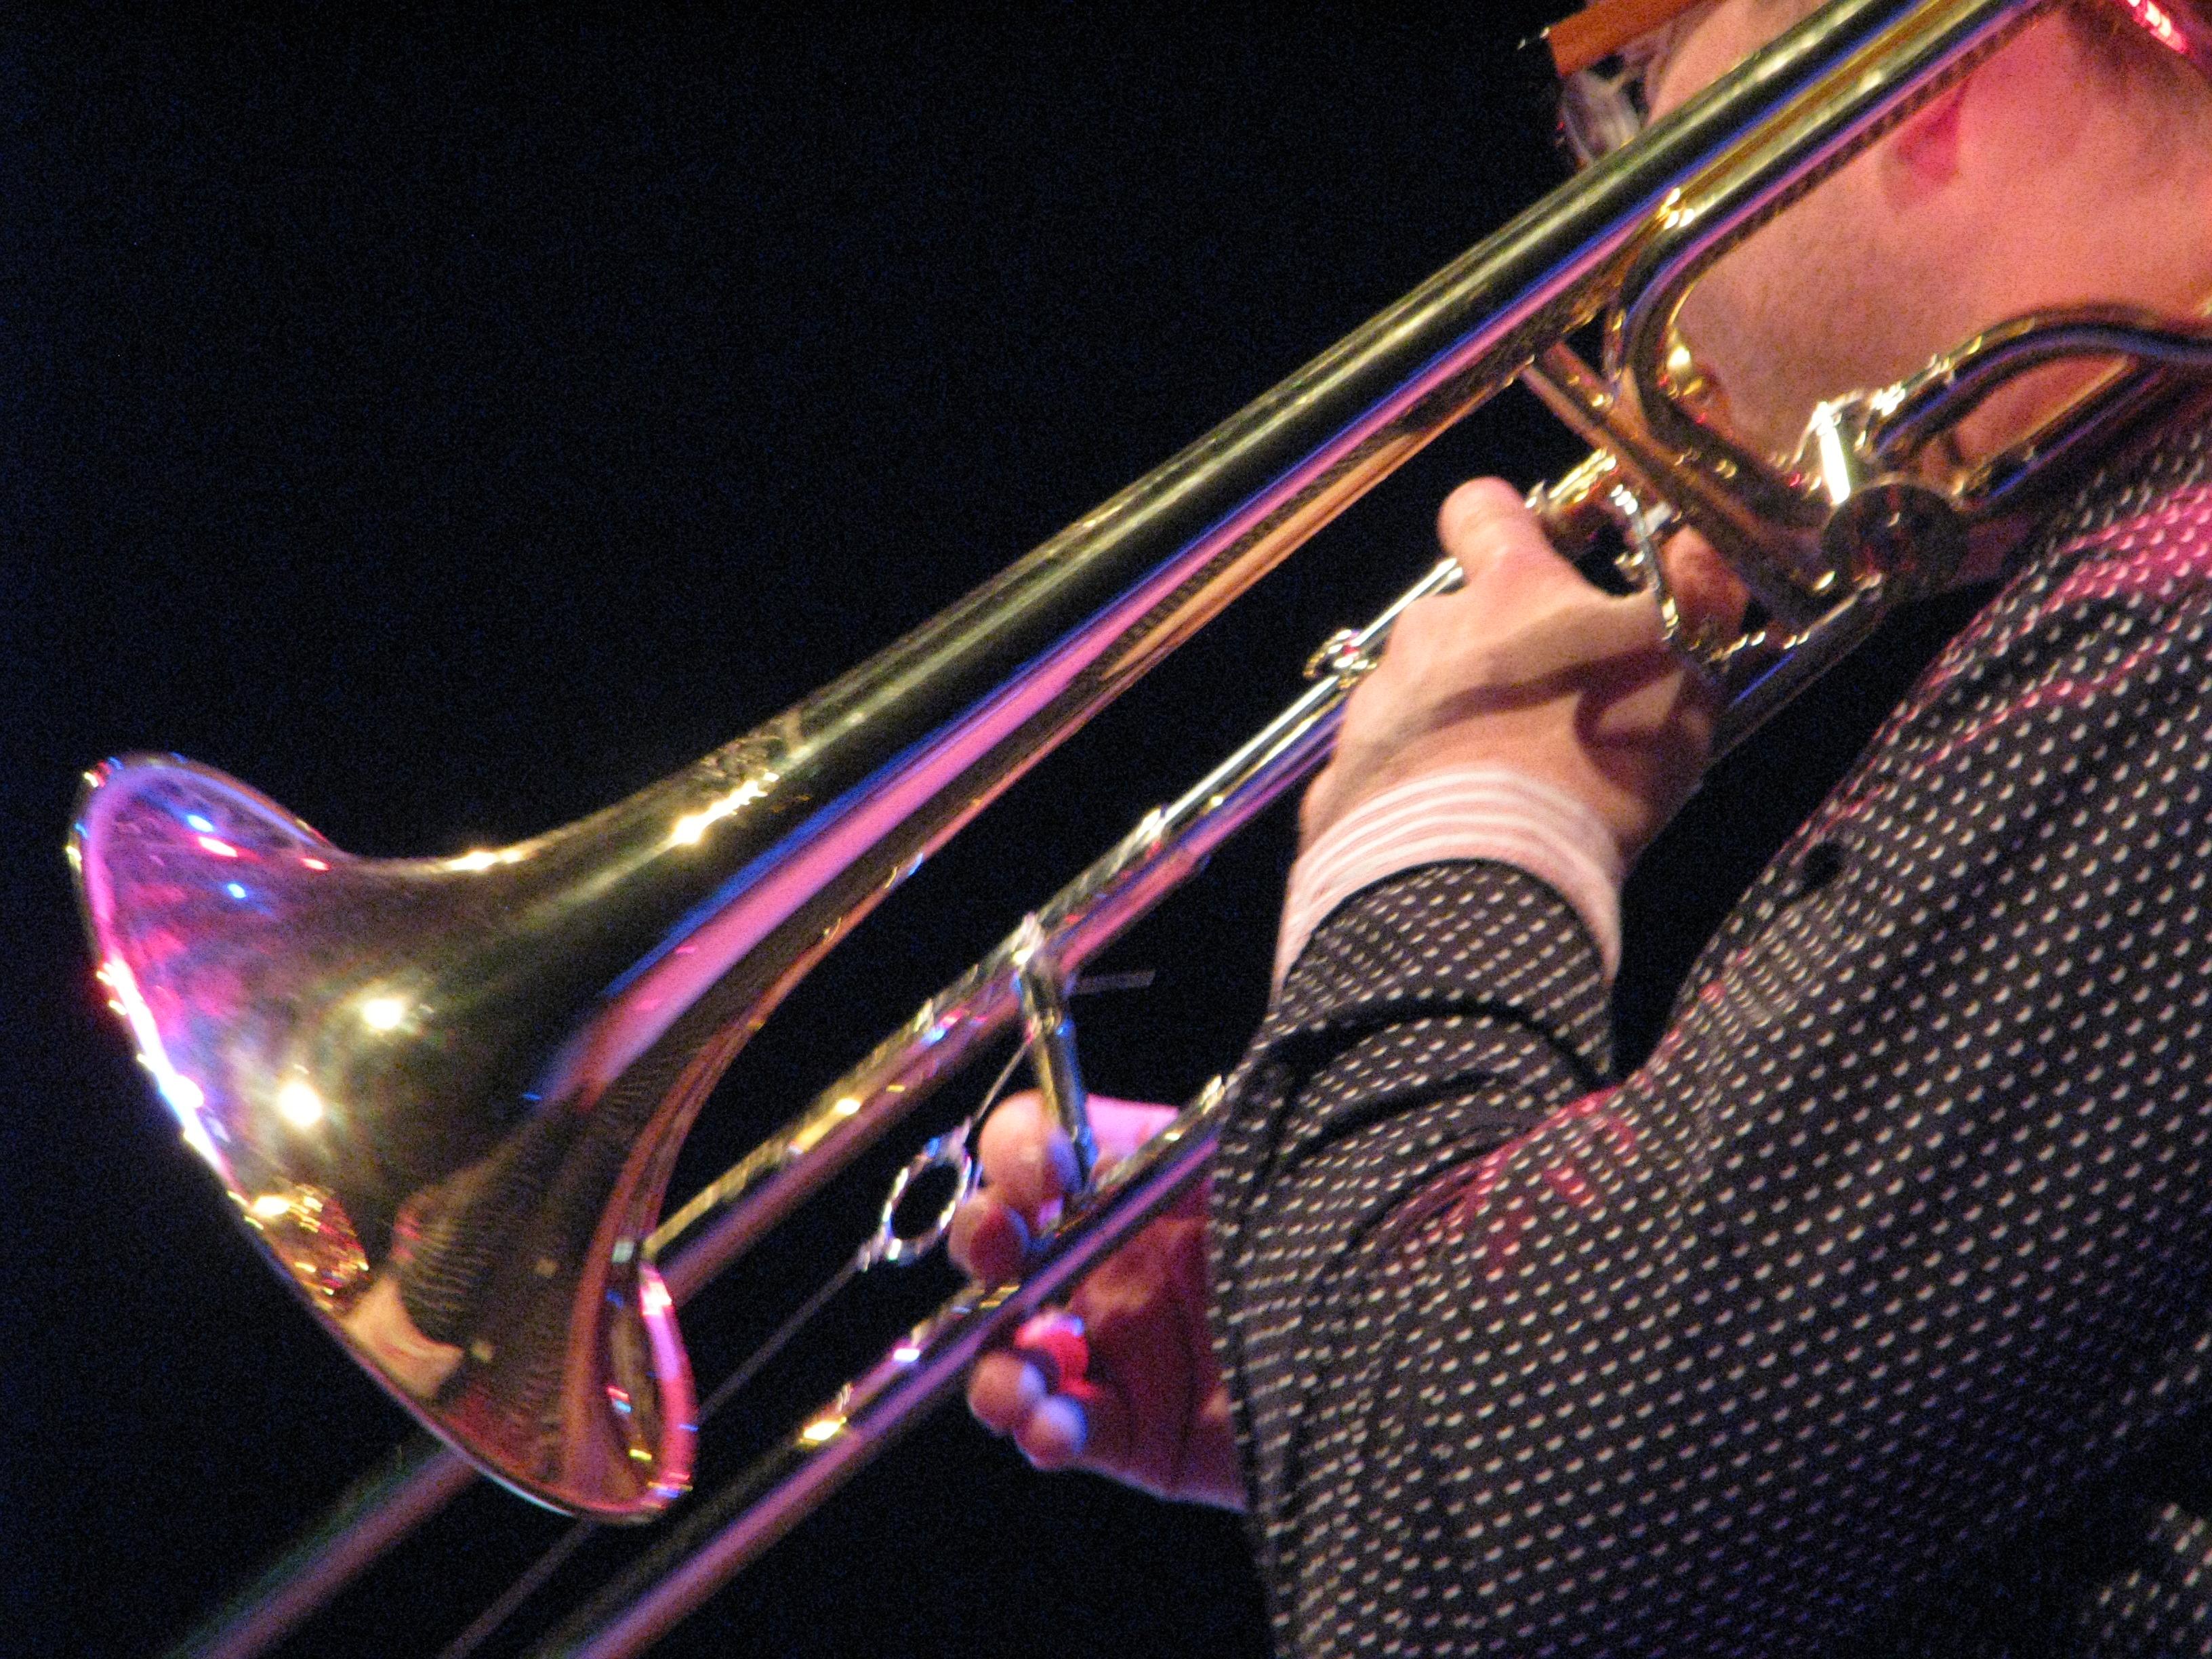 Samuel blaser jazzdor berlin 2013 j.a.s.s.